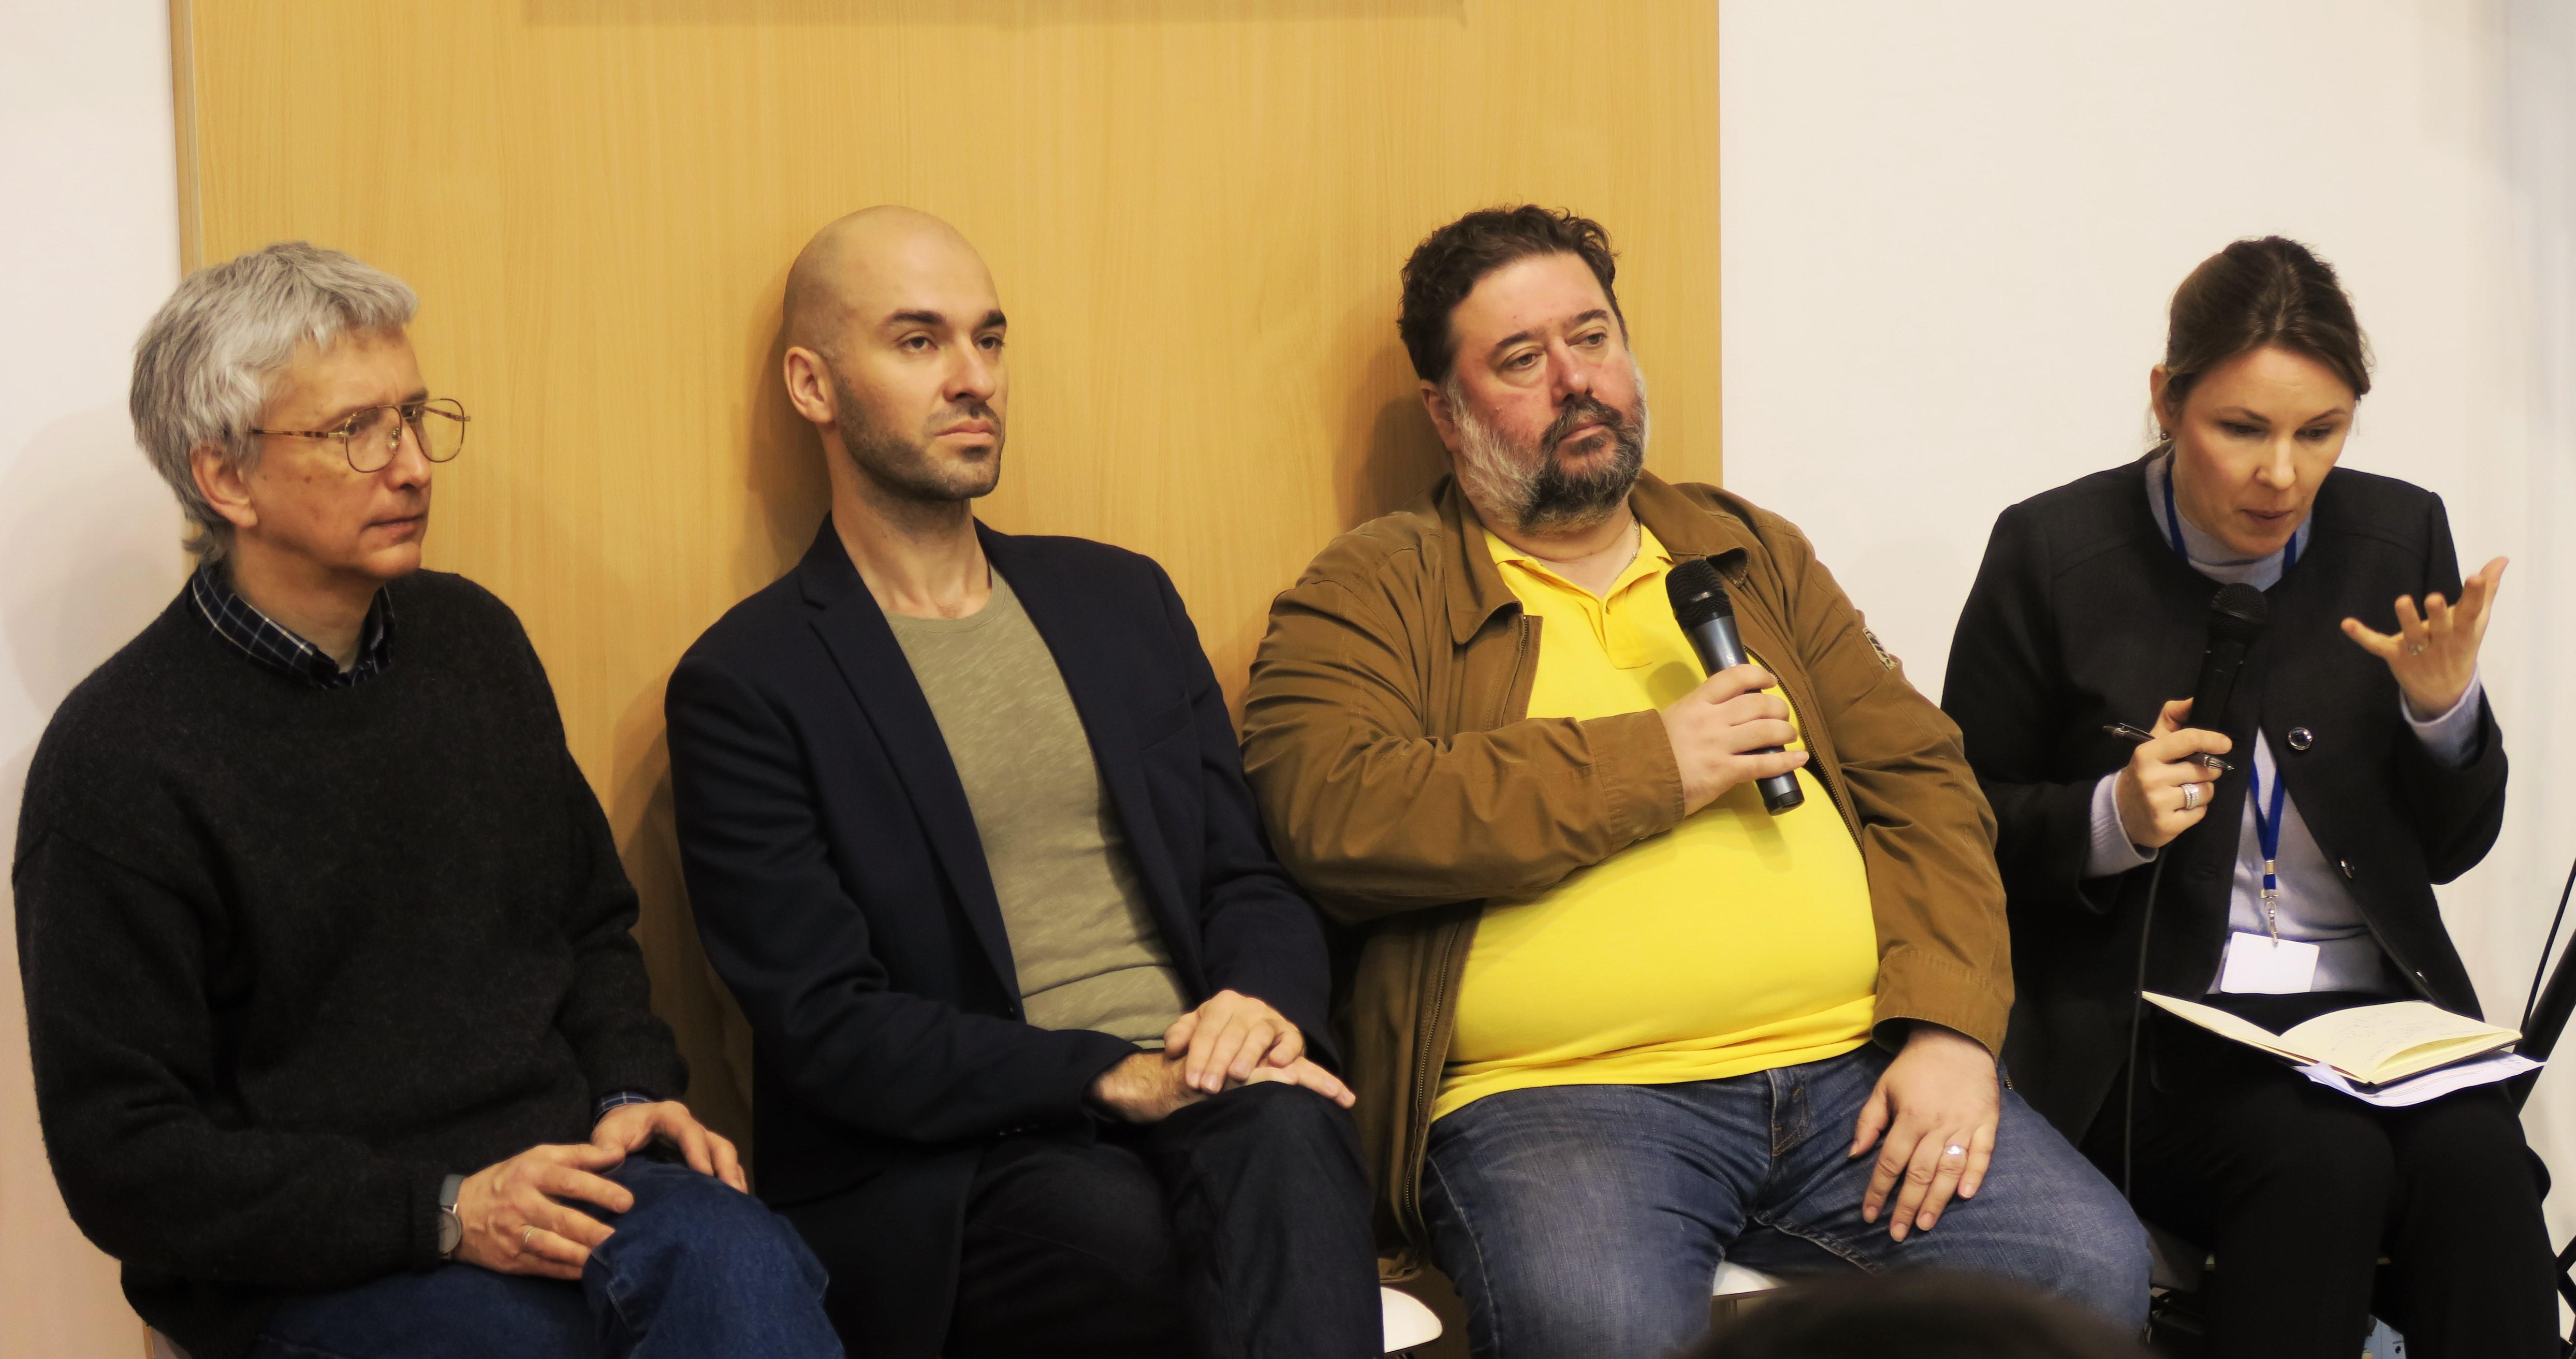 Alexandre Sneguirev, Dmitri Danilov et Vassili Golovanov